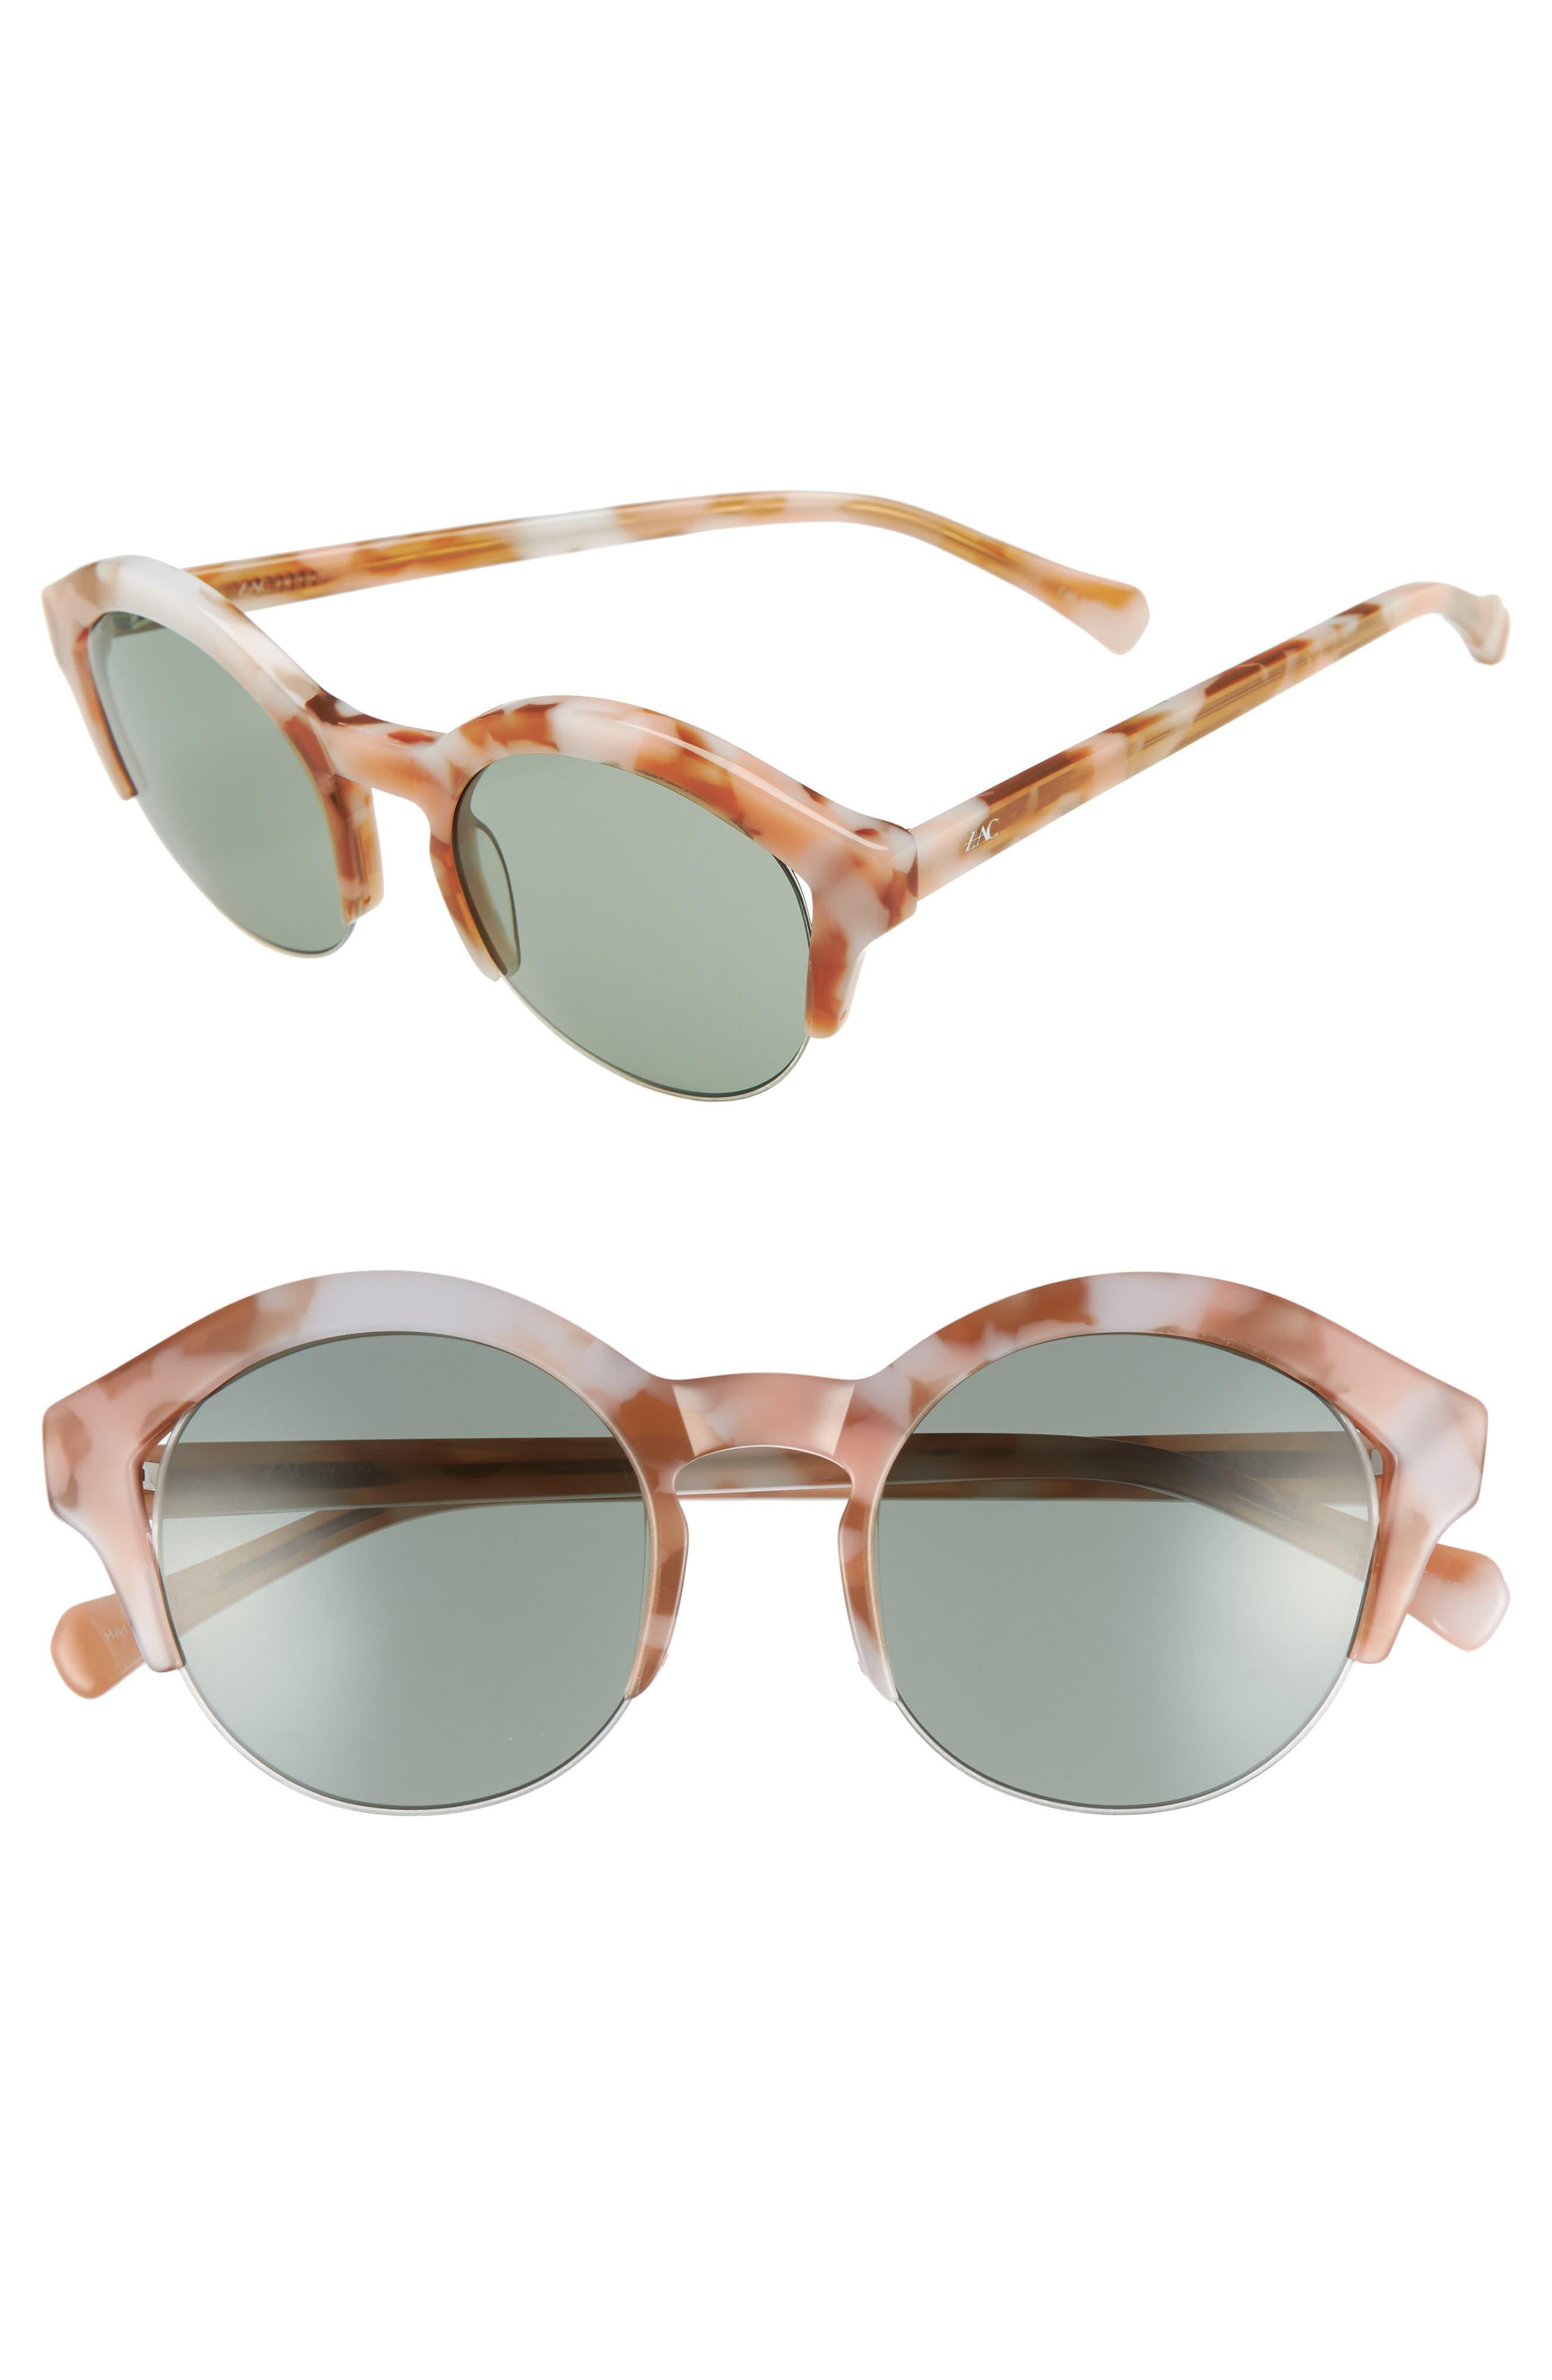 Bren 51mm Half-Rim Sunglasses,                             Main thumbnail 1, color,                             Pink/ Tortoise Green